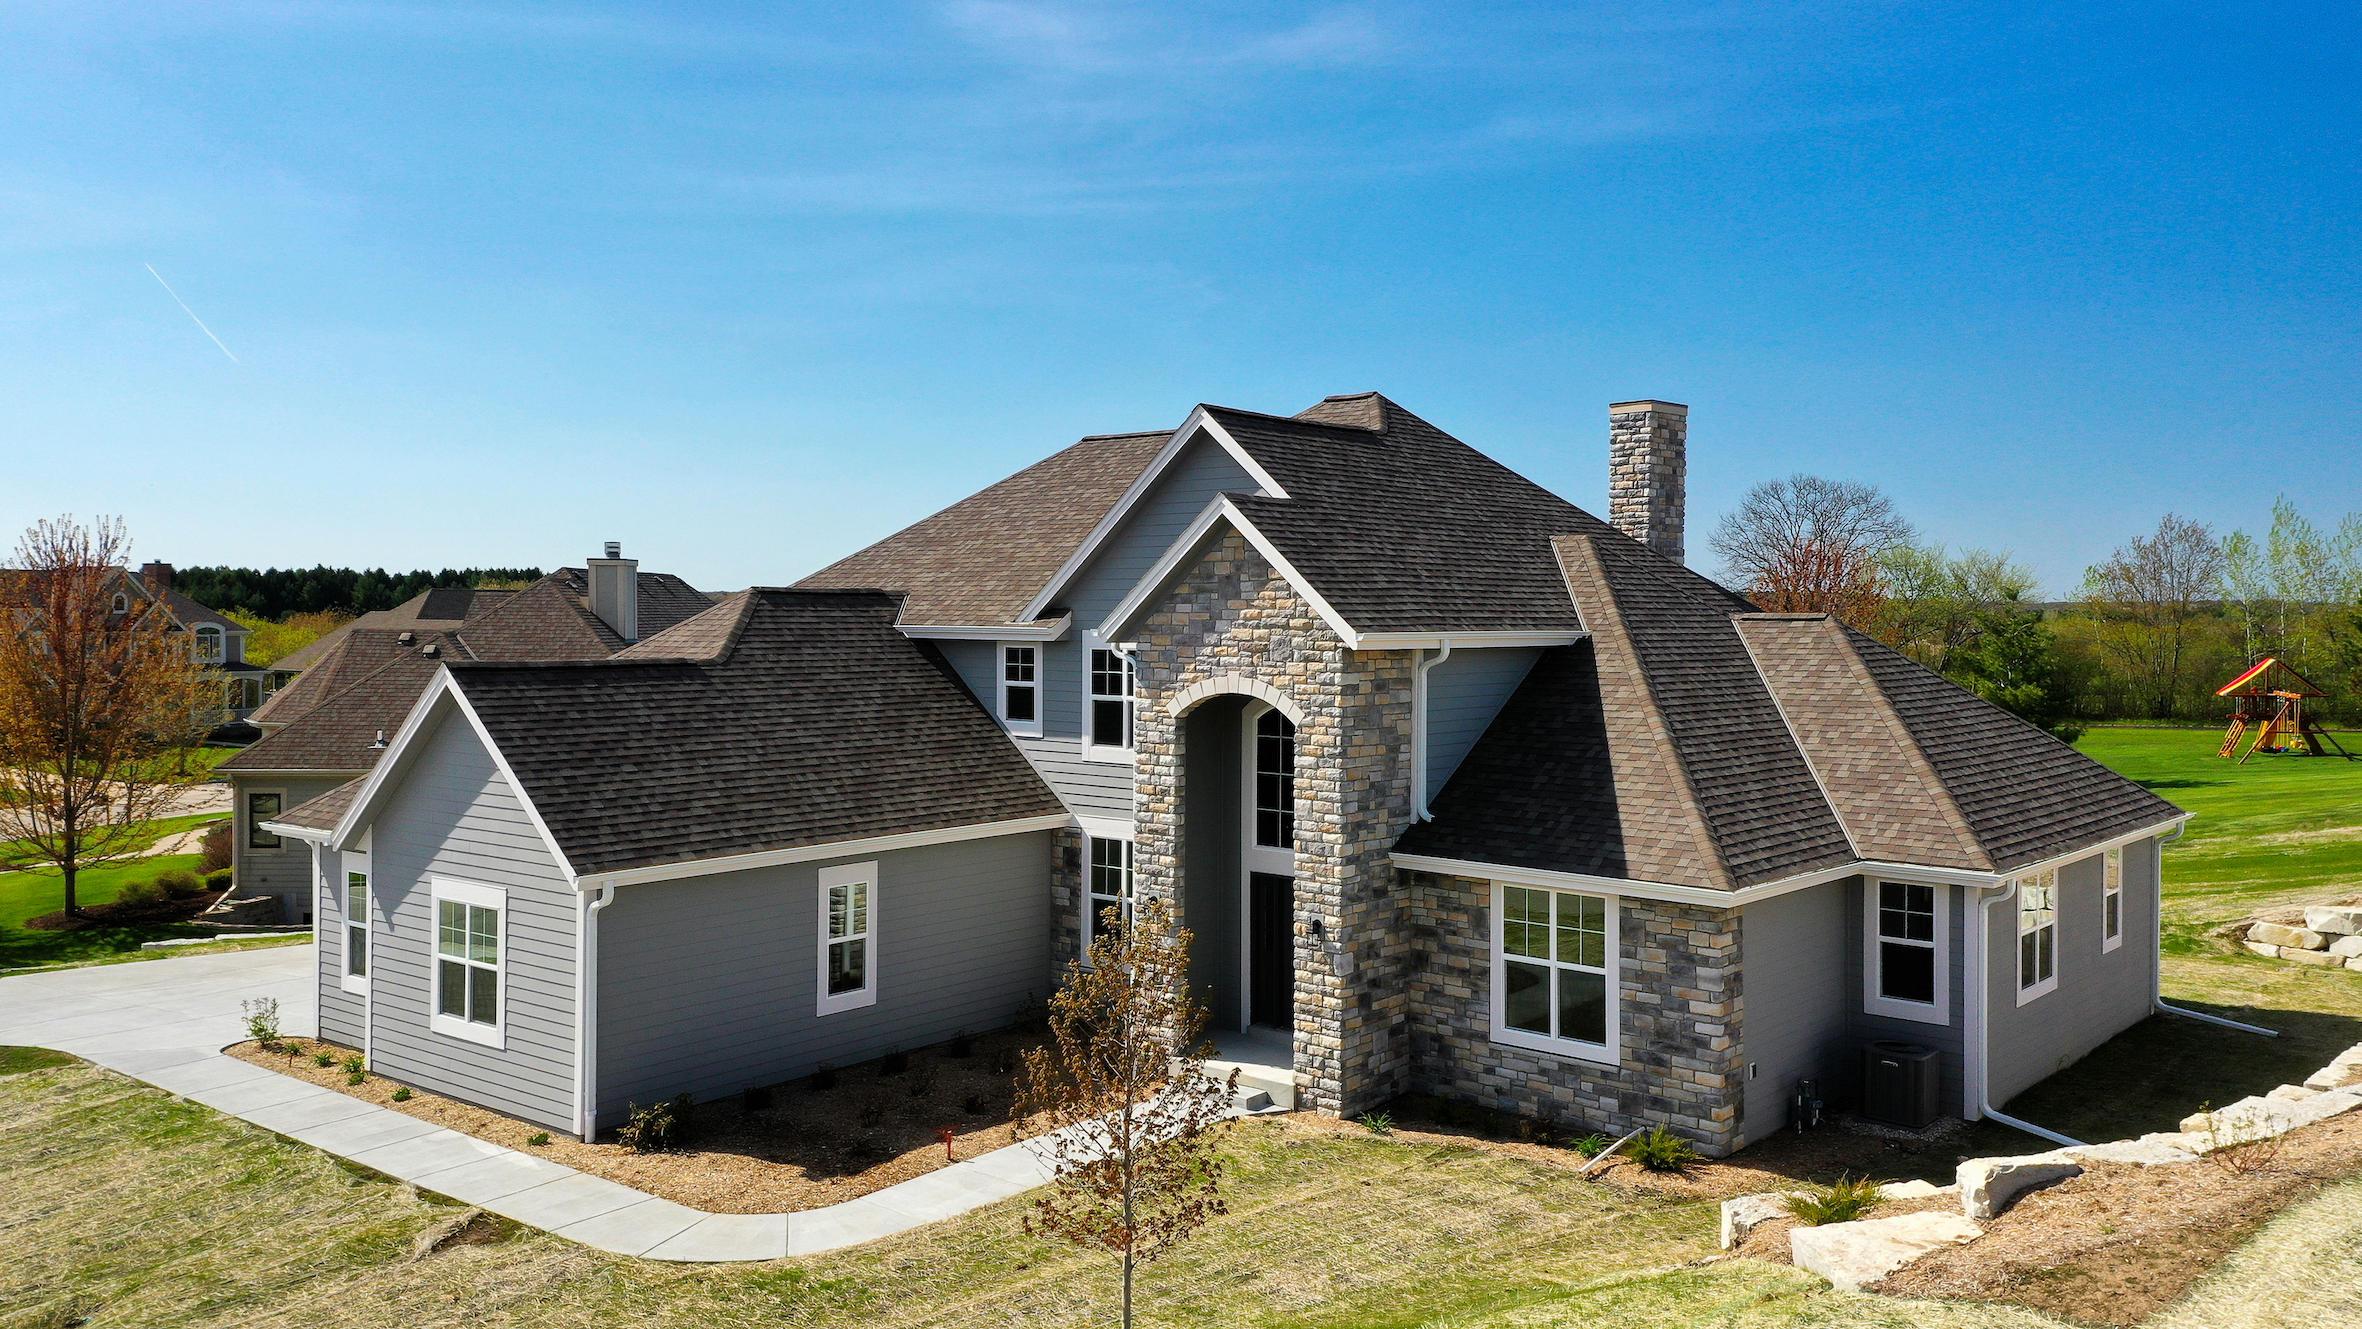 566 Birchwood Dr, Hartland, Wisconsin 53029, 4 Bedrooms Bedrooms, ,2 BathroomsBathrooms,Single-Family,For Sale,Birchwood Dr,1697920